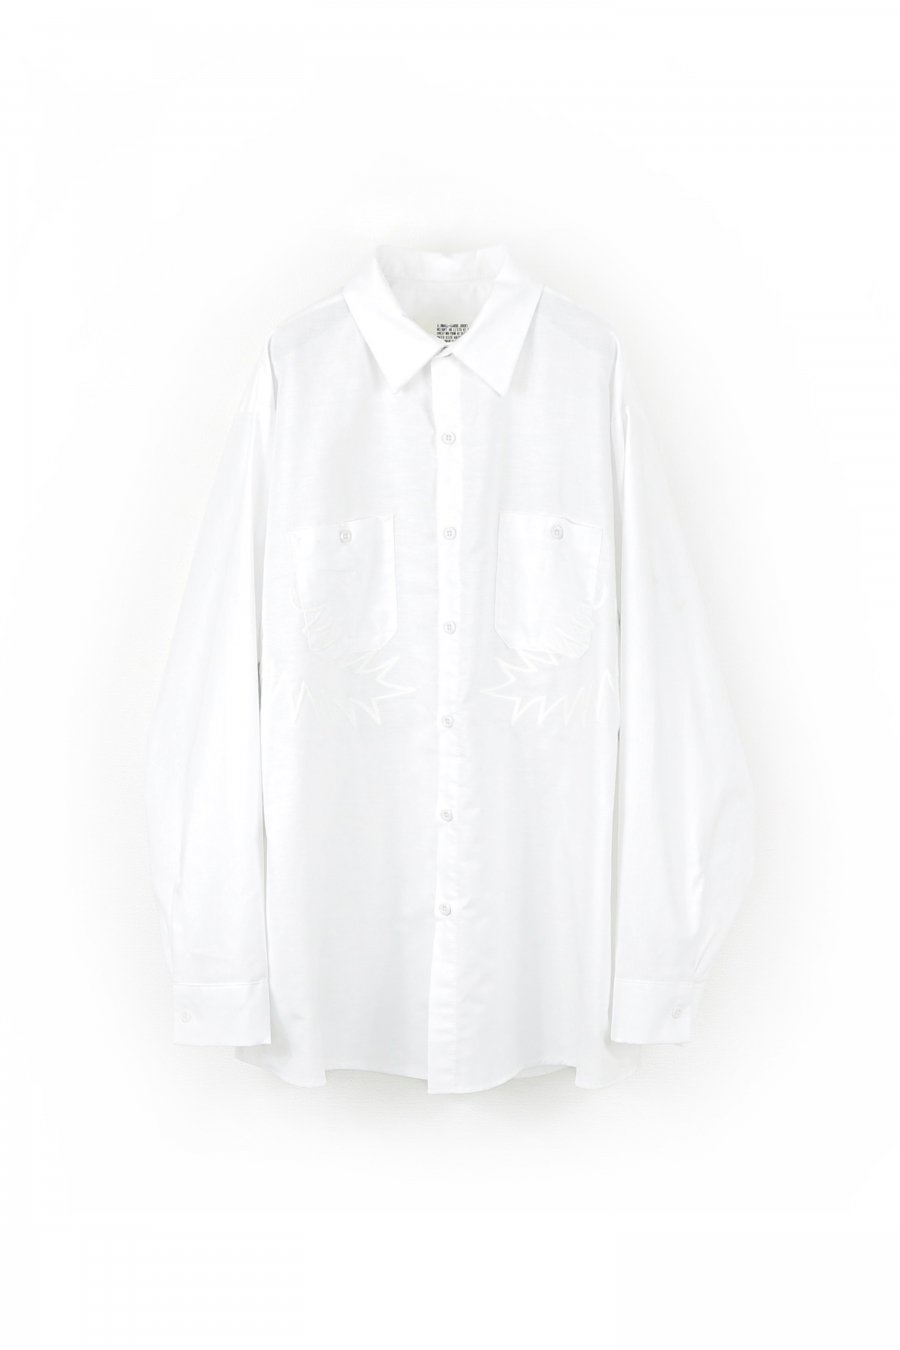 elephant TRIBAL fabrics  Palm leaf embroidery work shirt(WHITE)<img class='new_mark_img2' src='https://img.shop-pro.jp/img/new/icons15.gif' style='border:none;display:inline;margin:0px;padding:0px;width:auto;' />